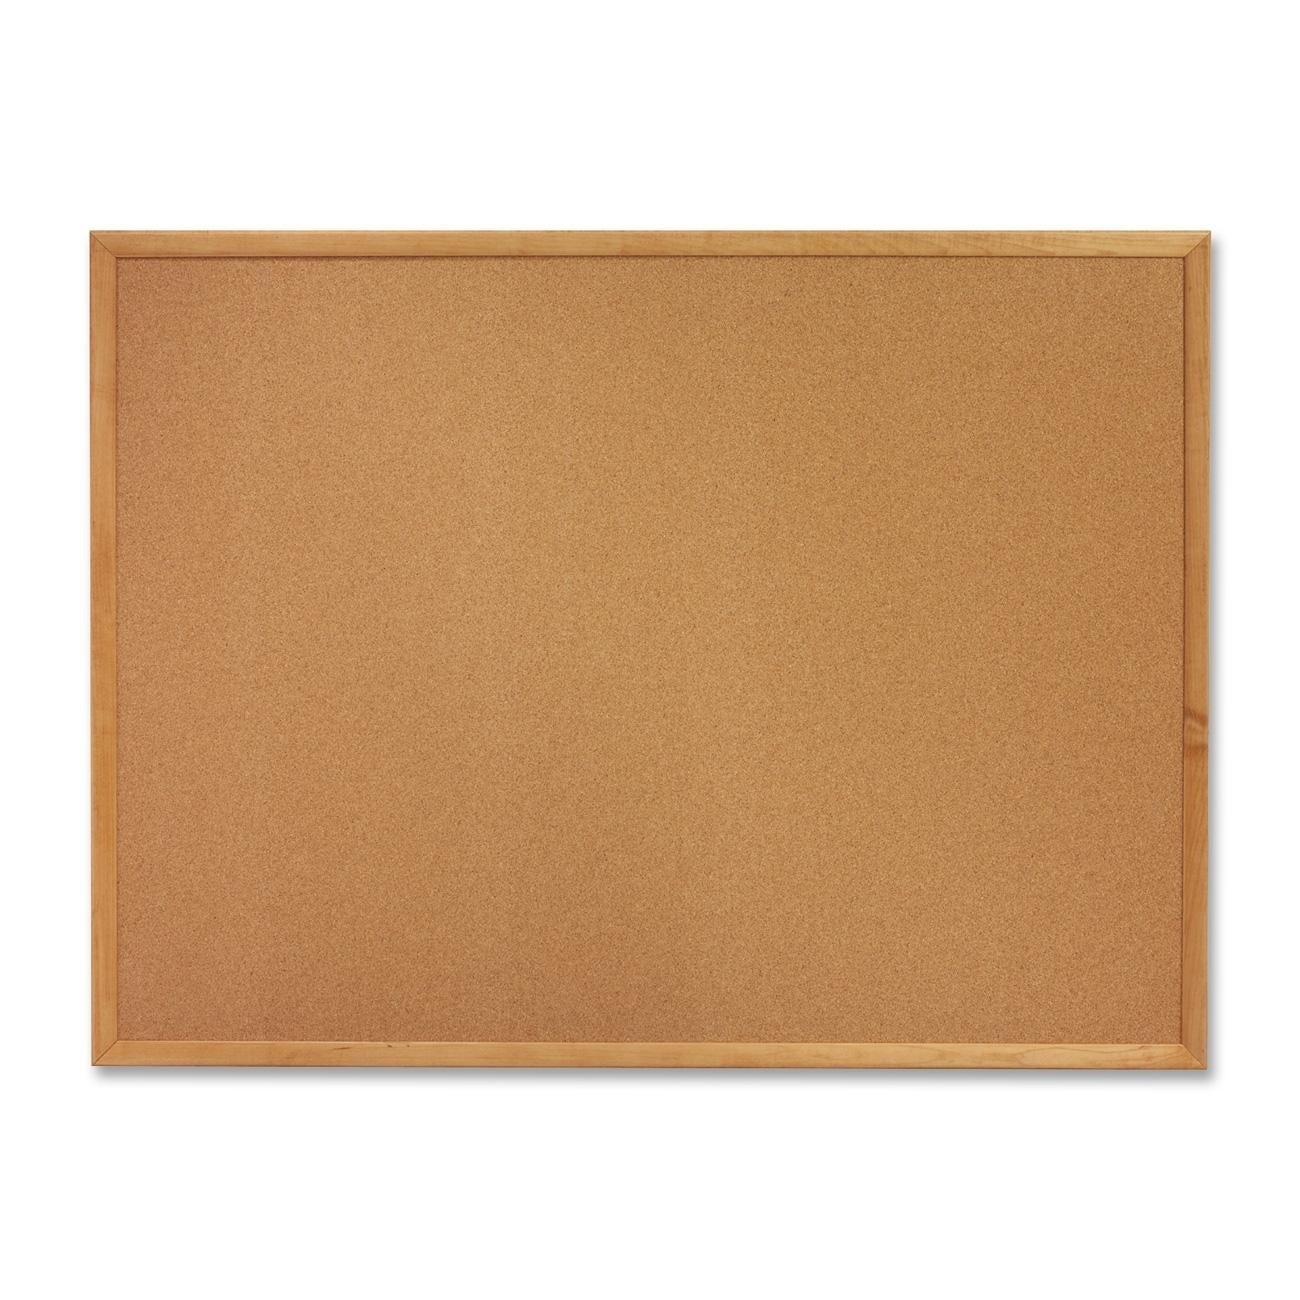 SPARCO Cork Board - (1/Each) (Master), Brown